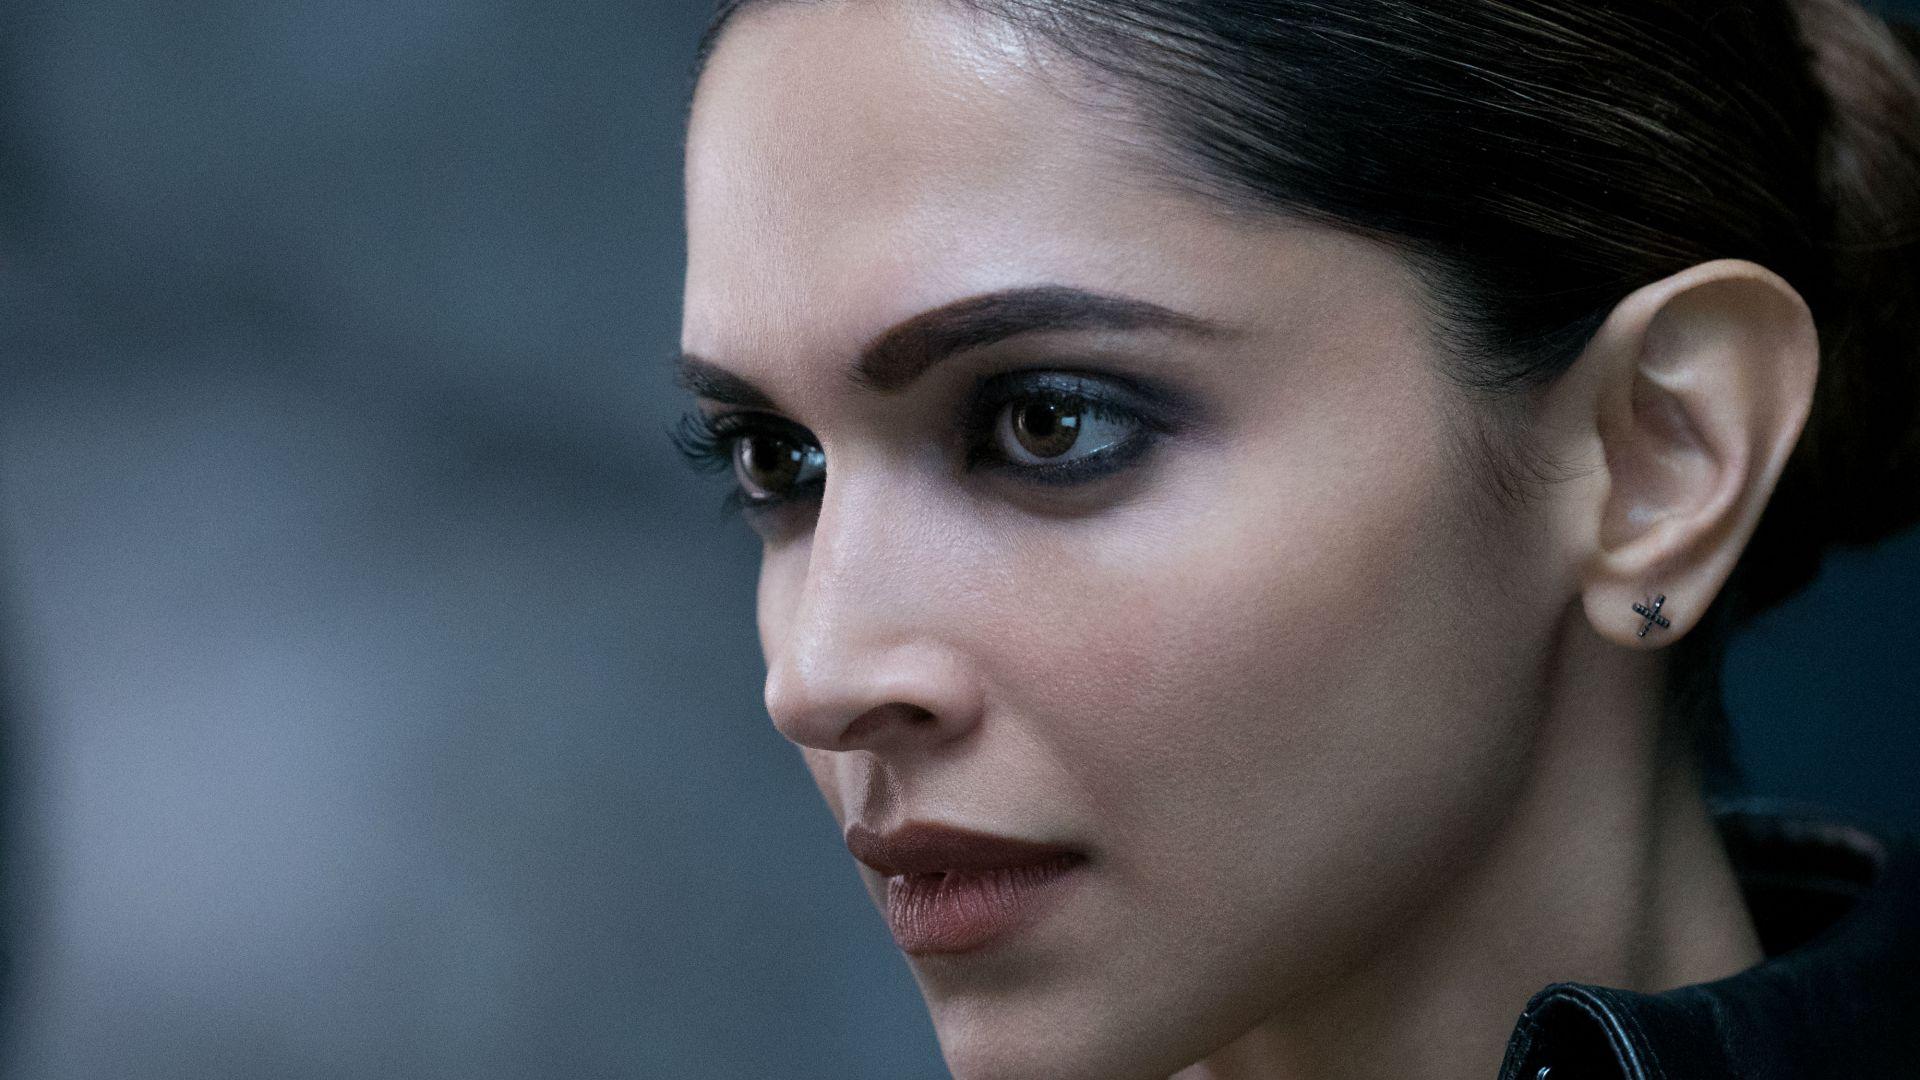 Wallpaper Deepika Padukone in xxx return of xander cage movie